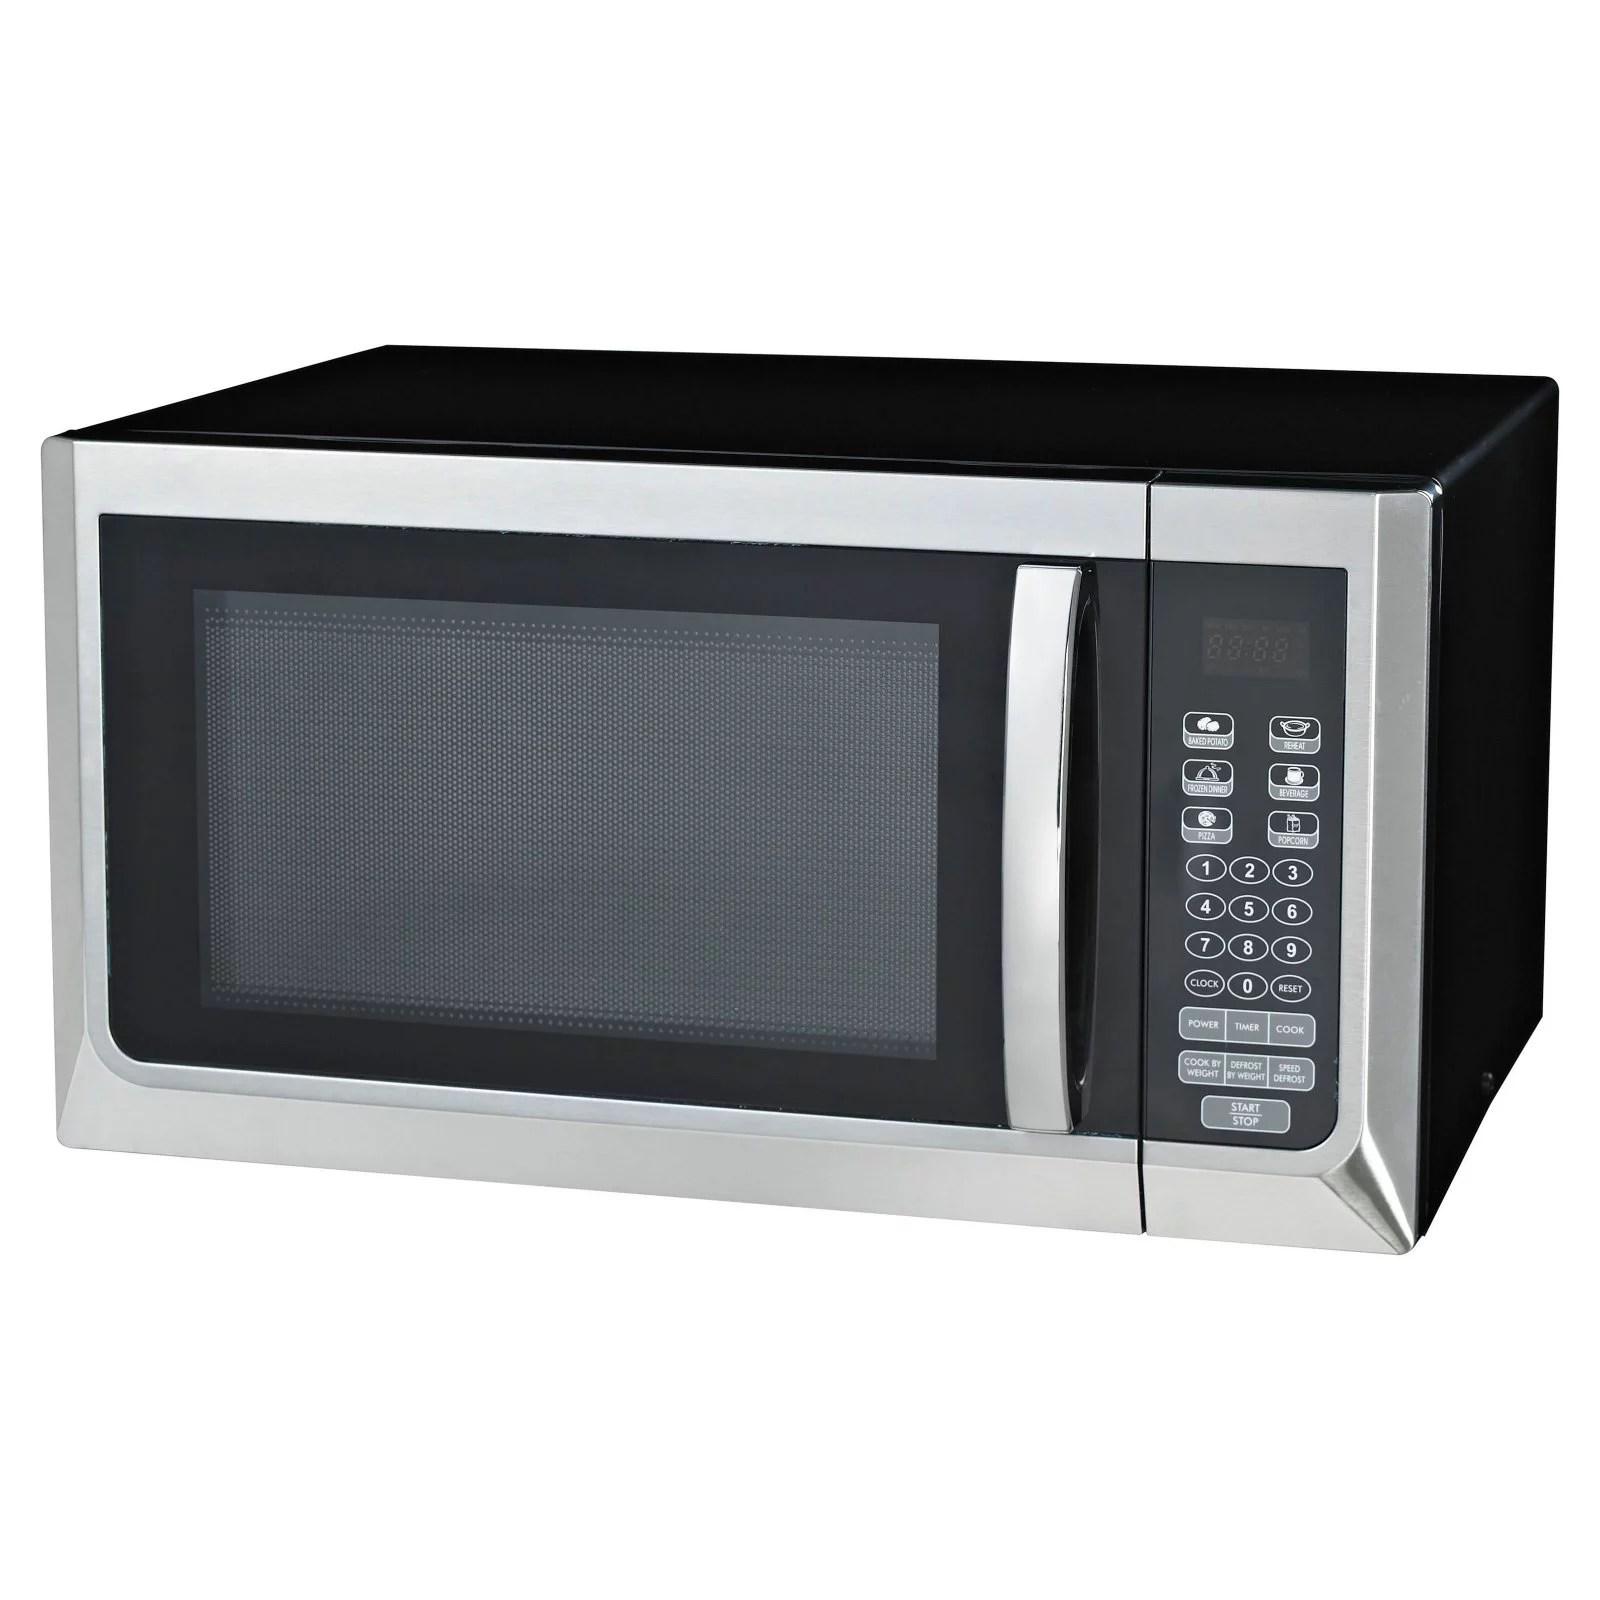 oster ogzc1101 1 1 cu ft digital microwave oven